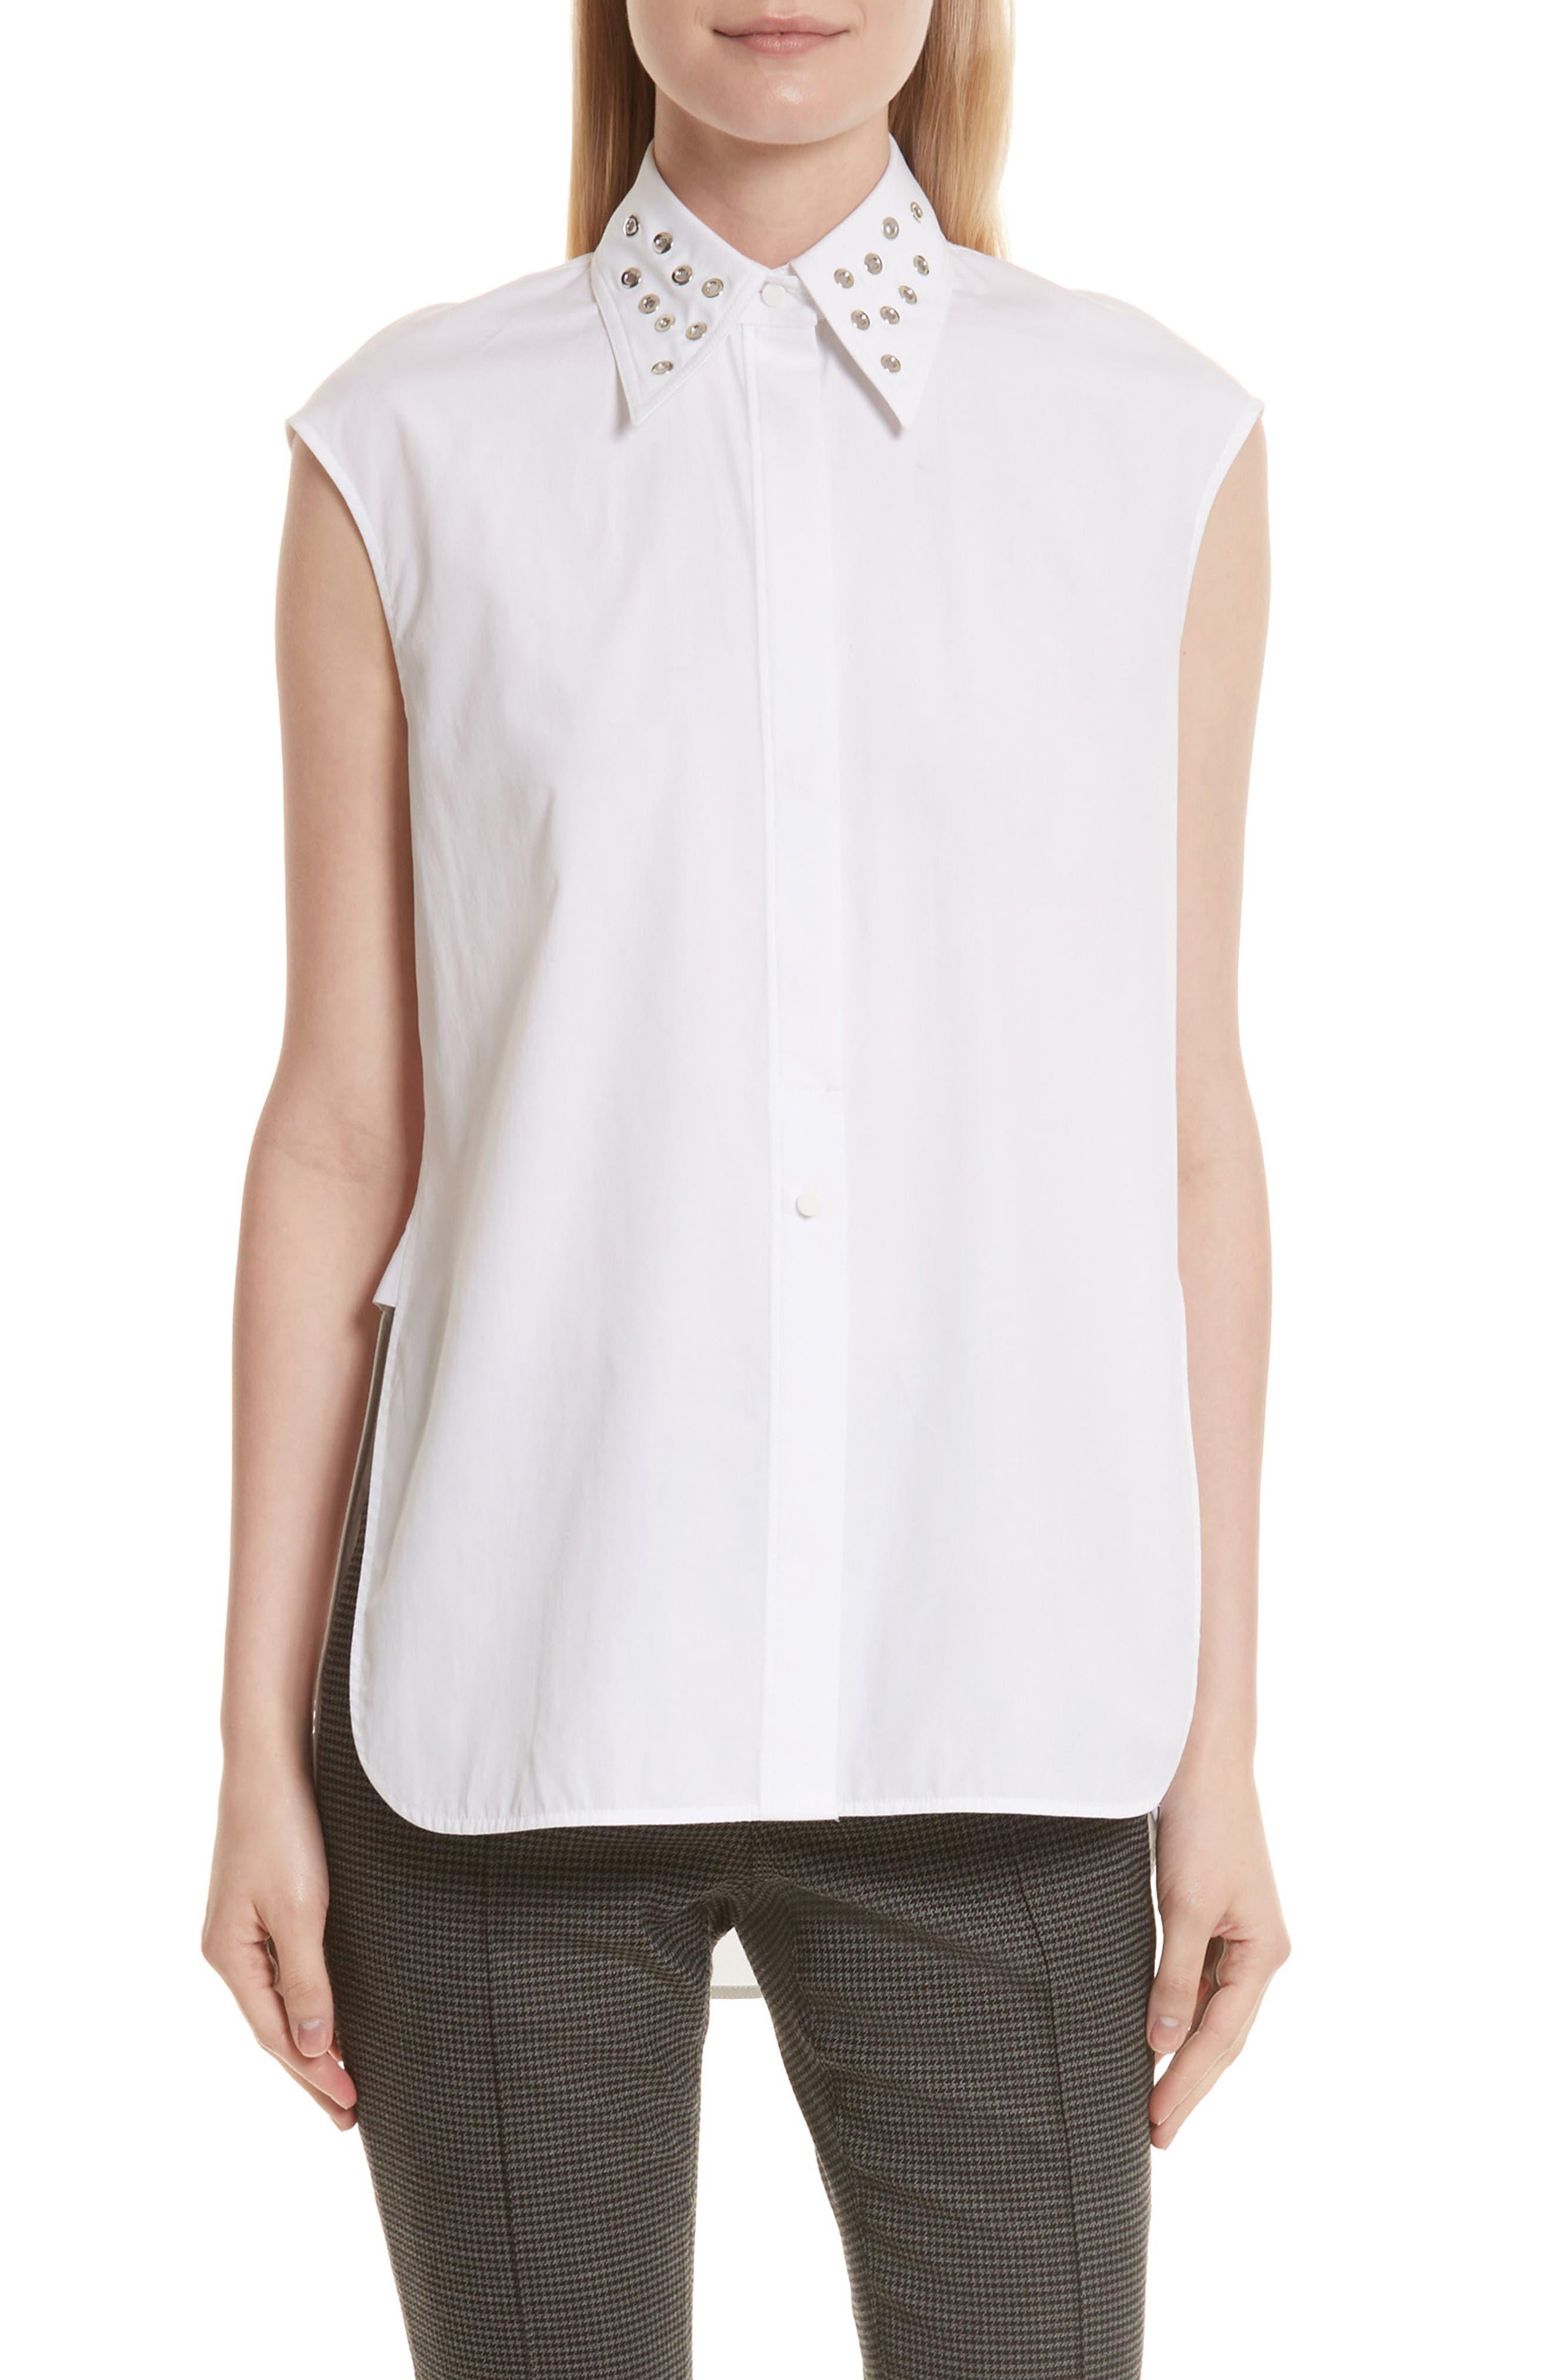 Helmut Lang Eyelet Cotton Poplin Shirt